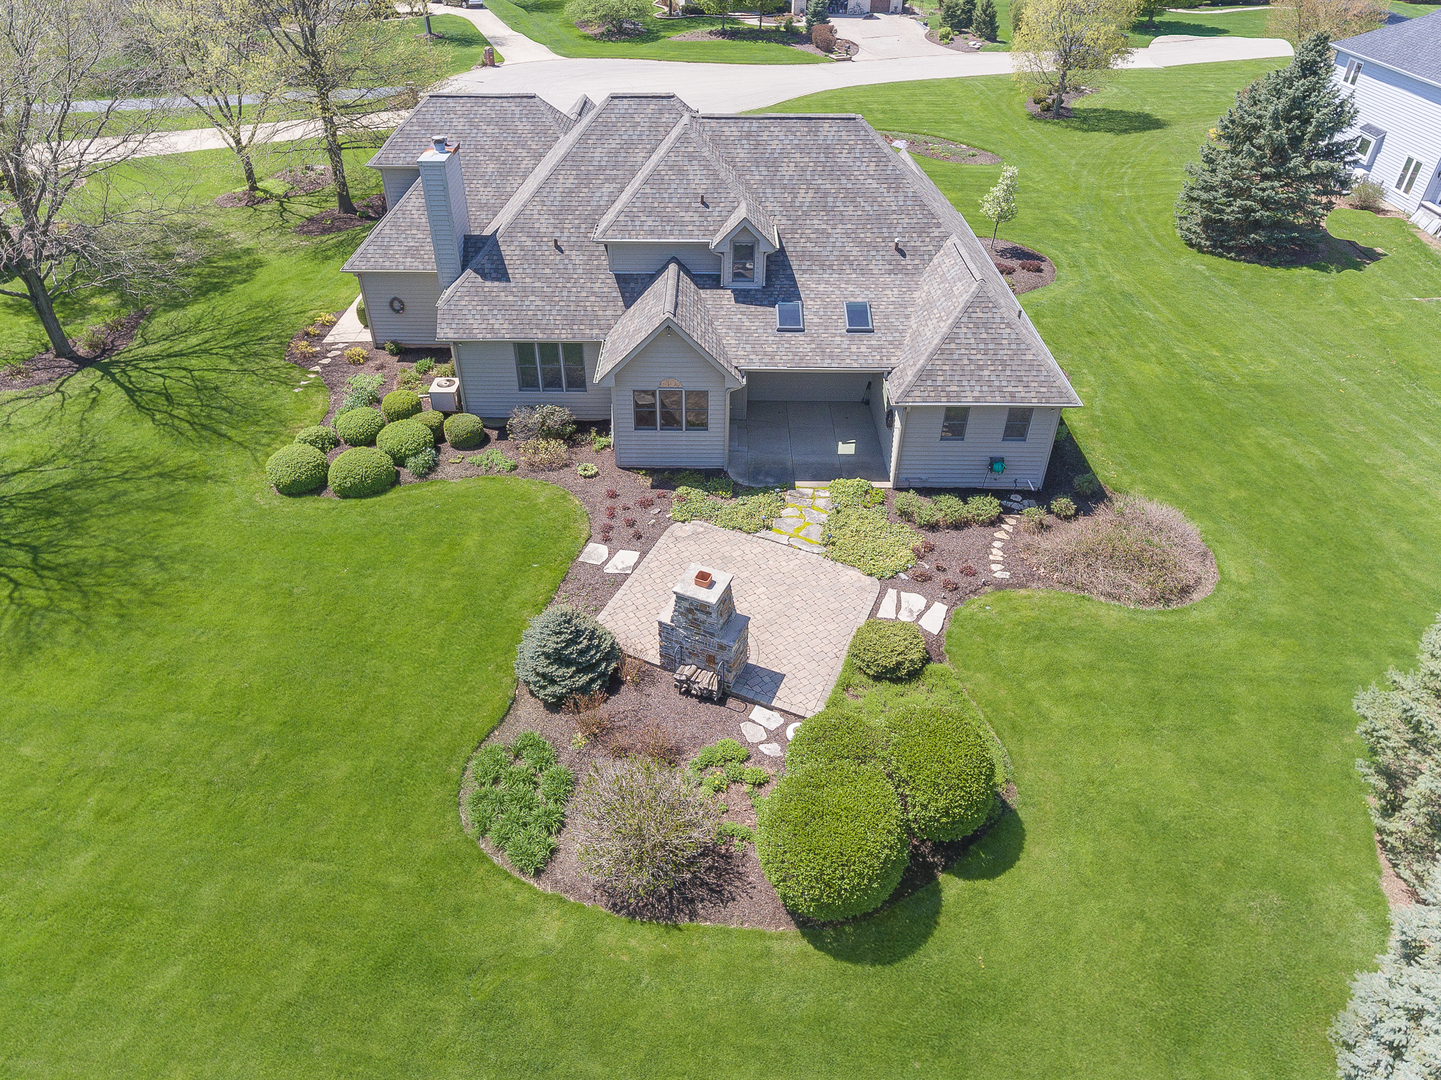 34 West Royal Oaks, Bristol, Illinois, 60512